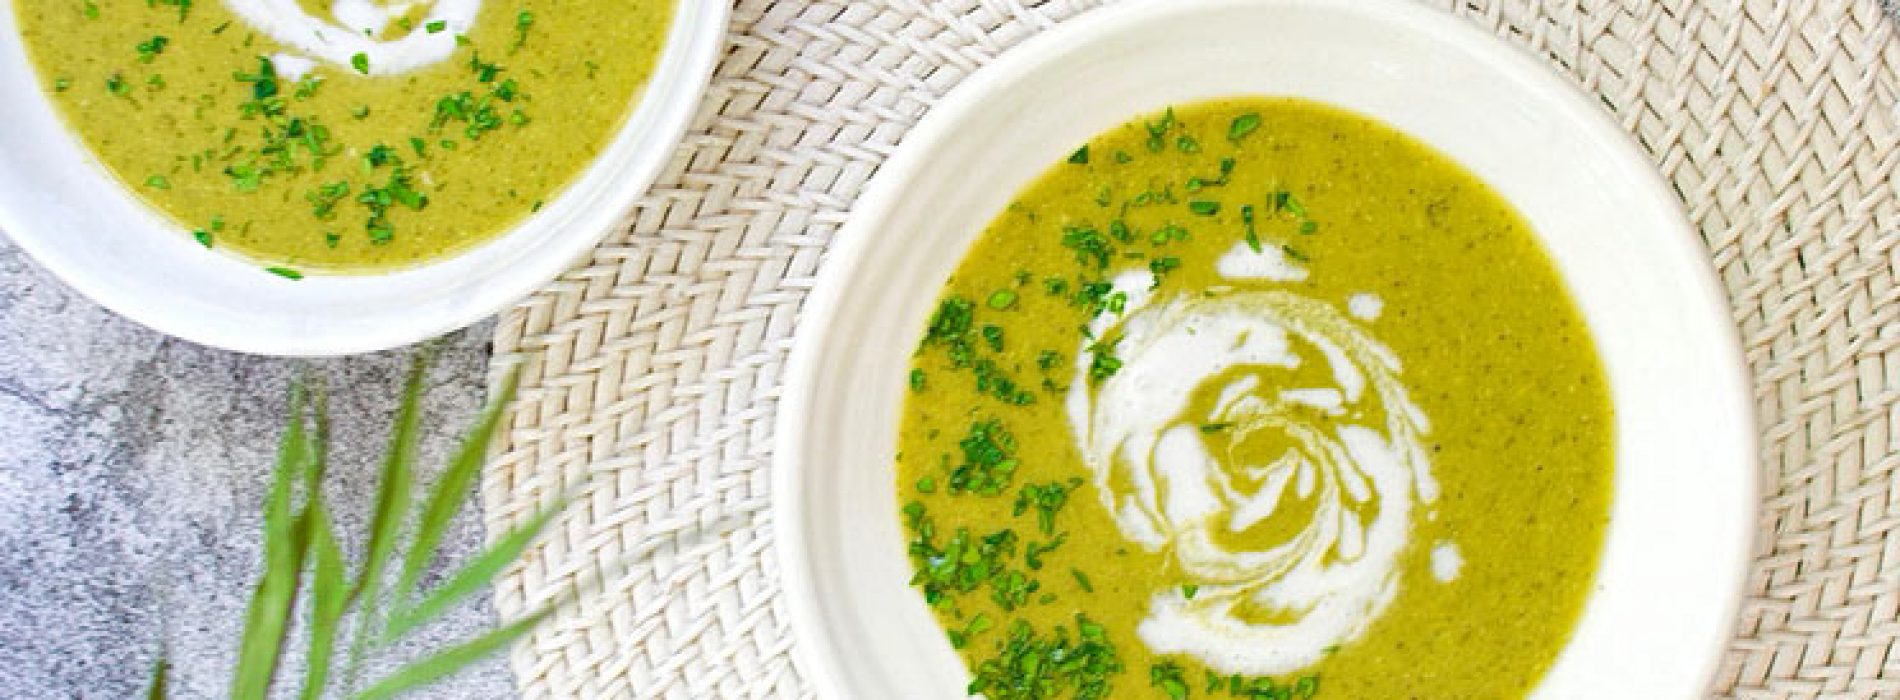 Darmgenezende knoflook Asperges Broccoli Soep – Recept